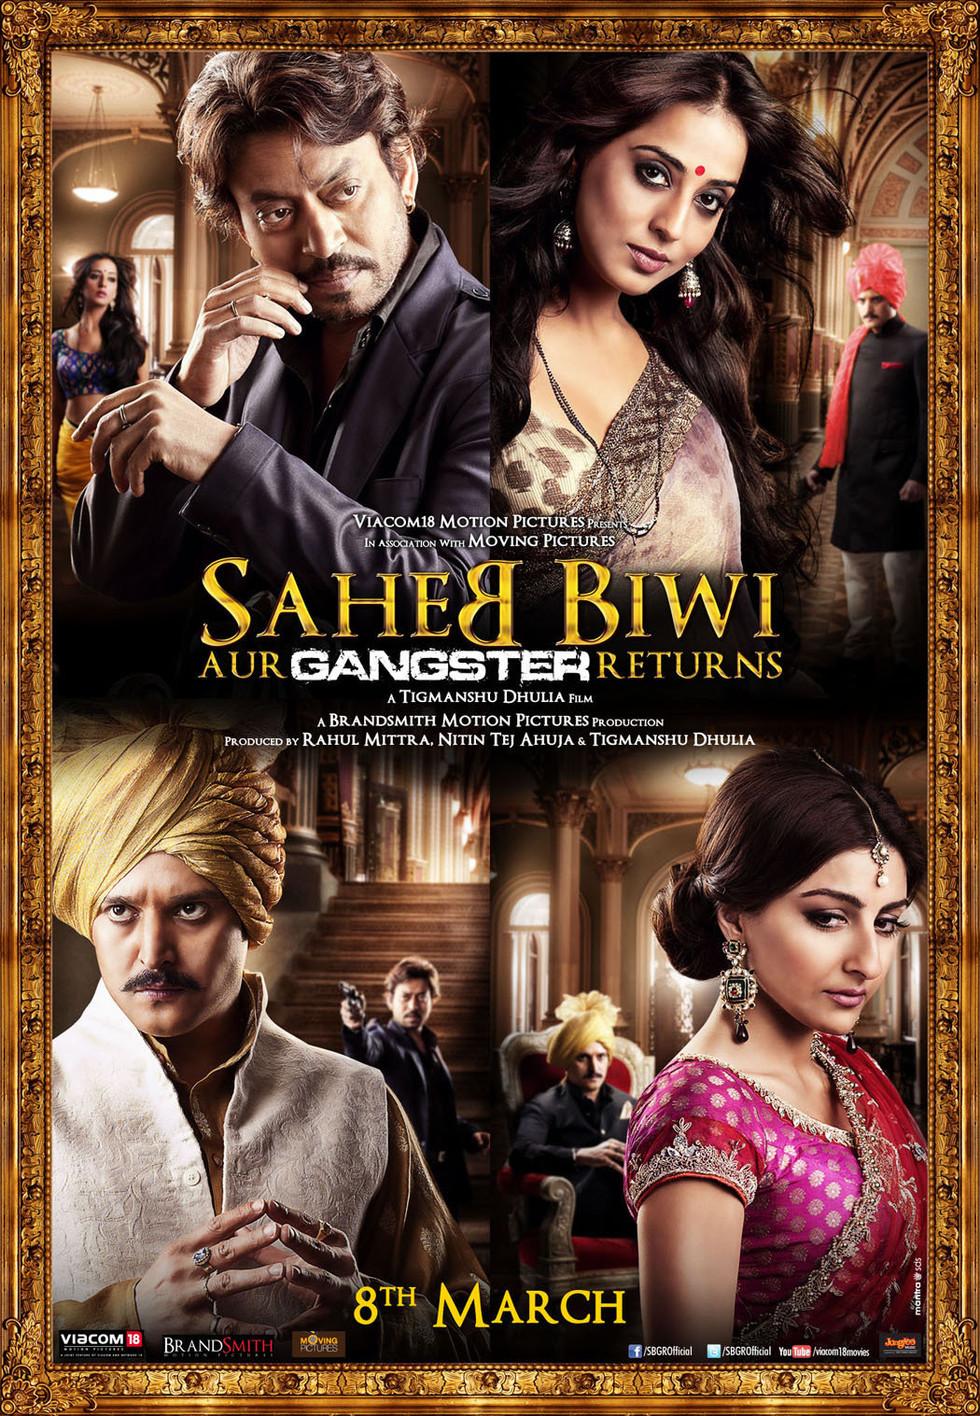 Saheb Biwi Aur Gangster Returns - Movie Poster #1 (Large)